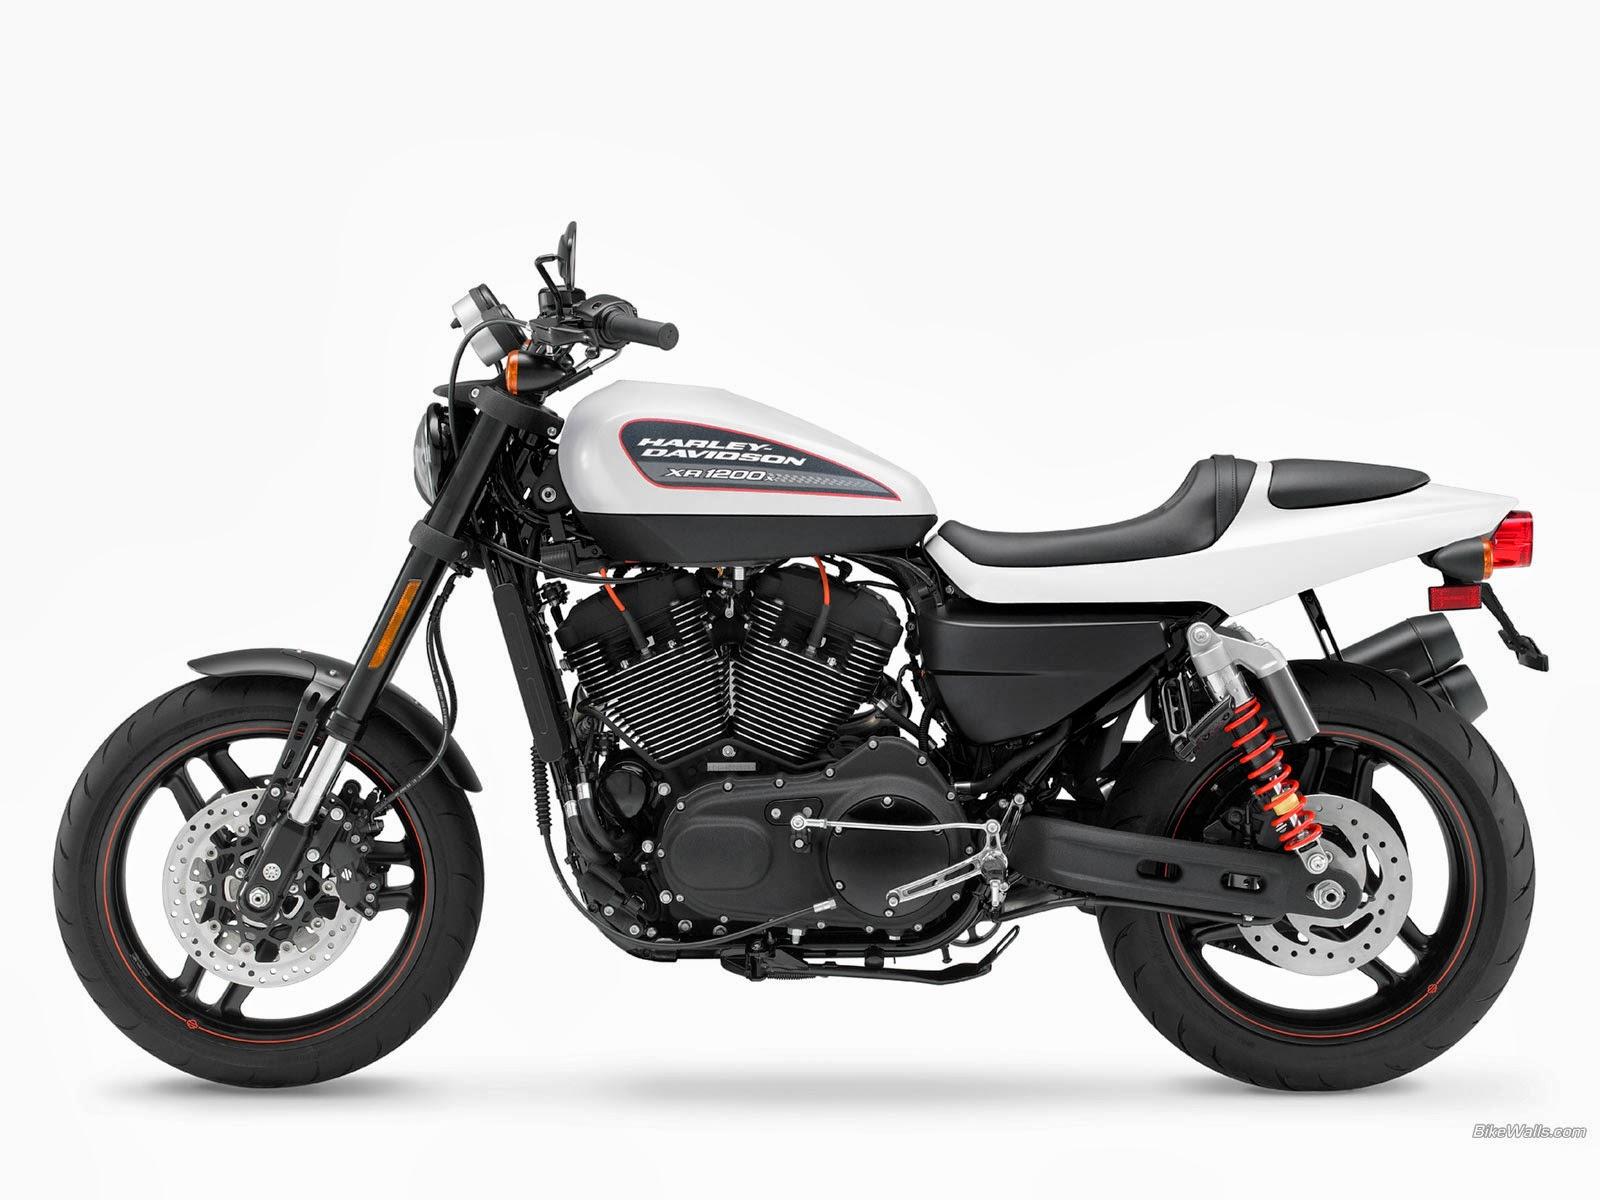 Harley Davidson XR 1200 X Sportster - Harley Davidson Motor